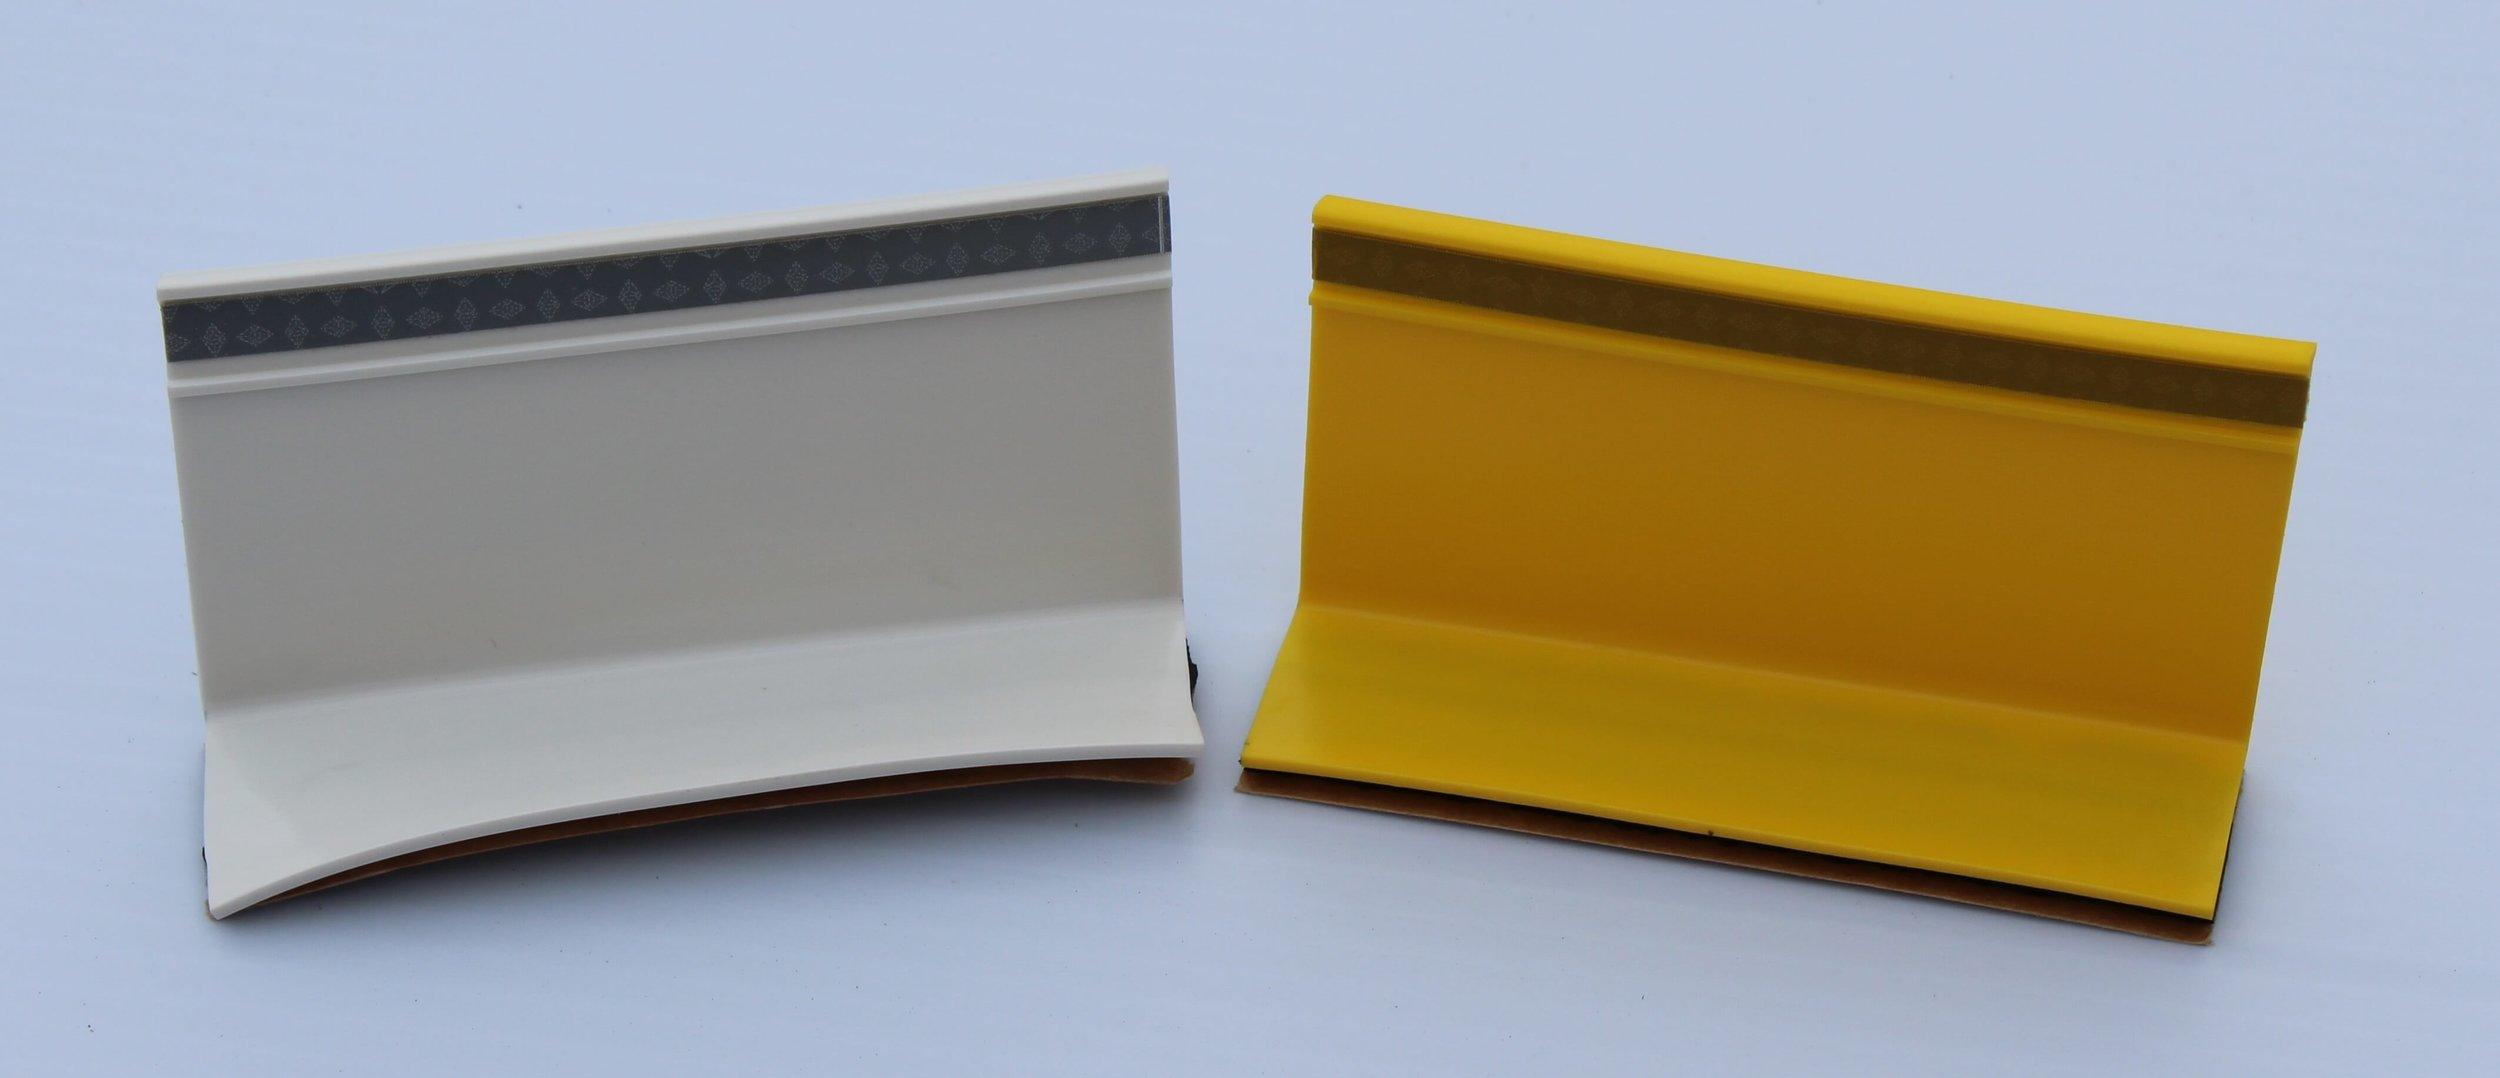 Chip Seal Marker